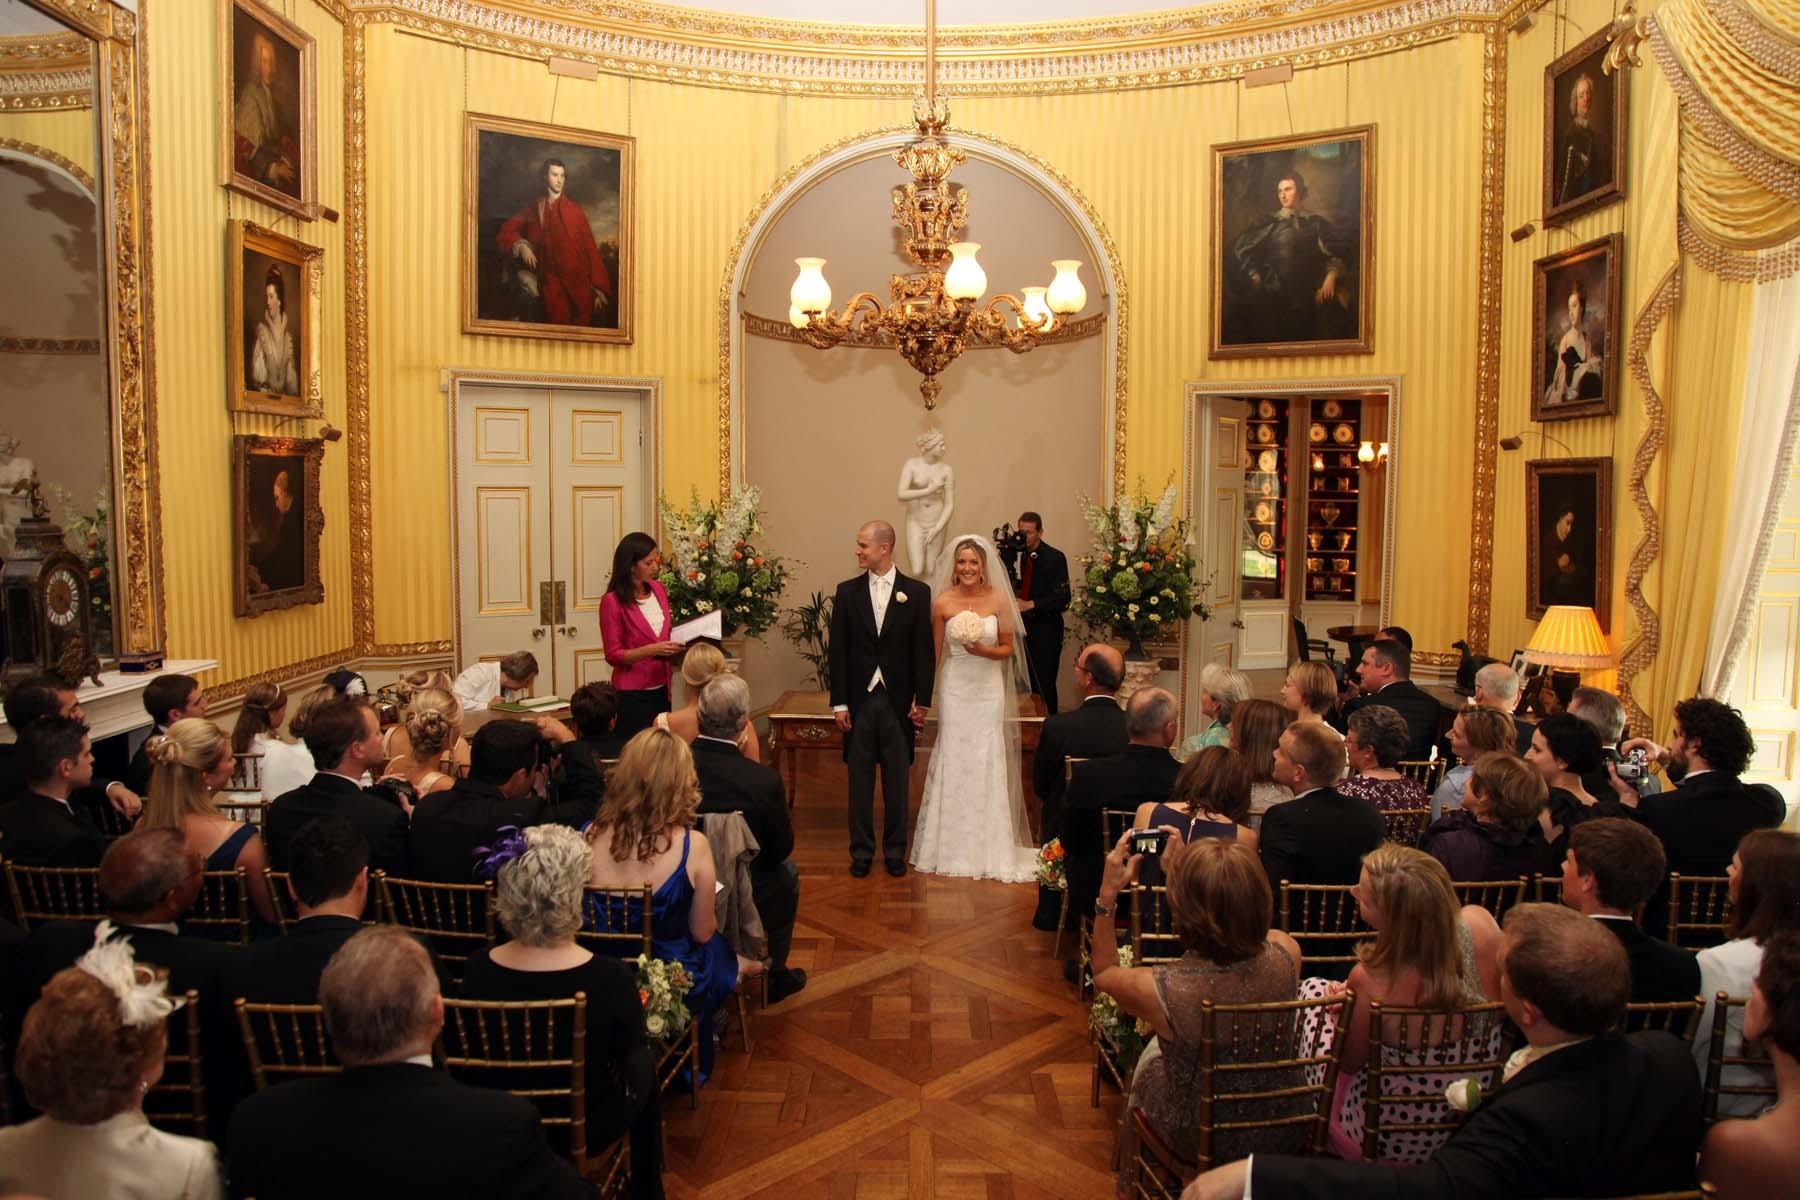 Sussex & Surrey Wedding Photographer - Ceremony (25)